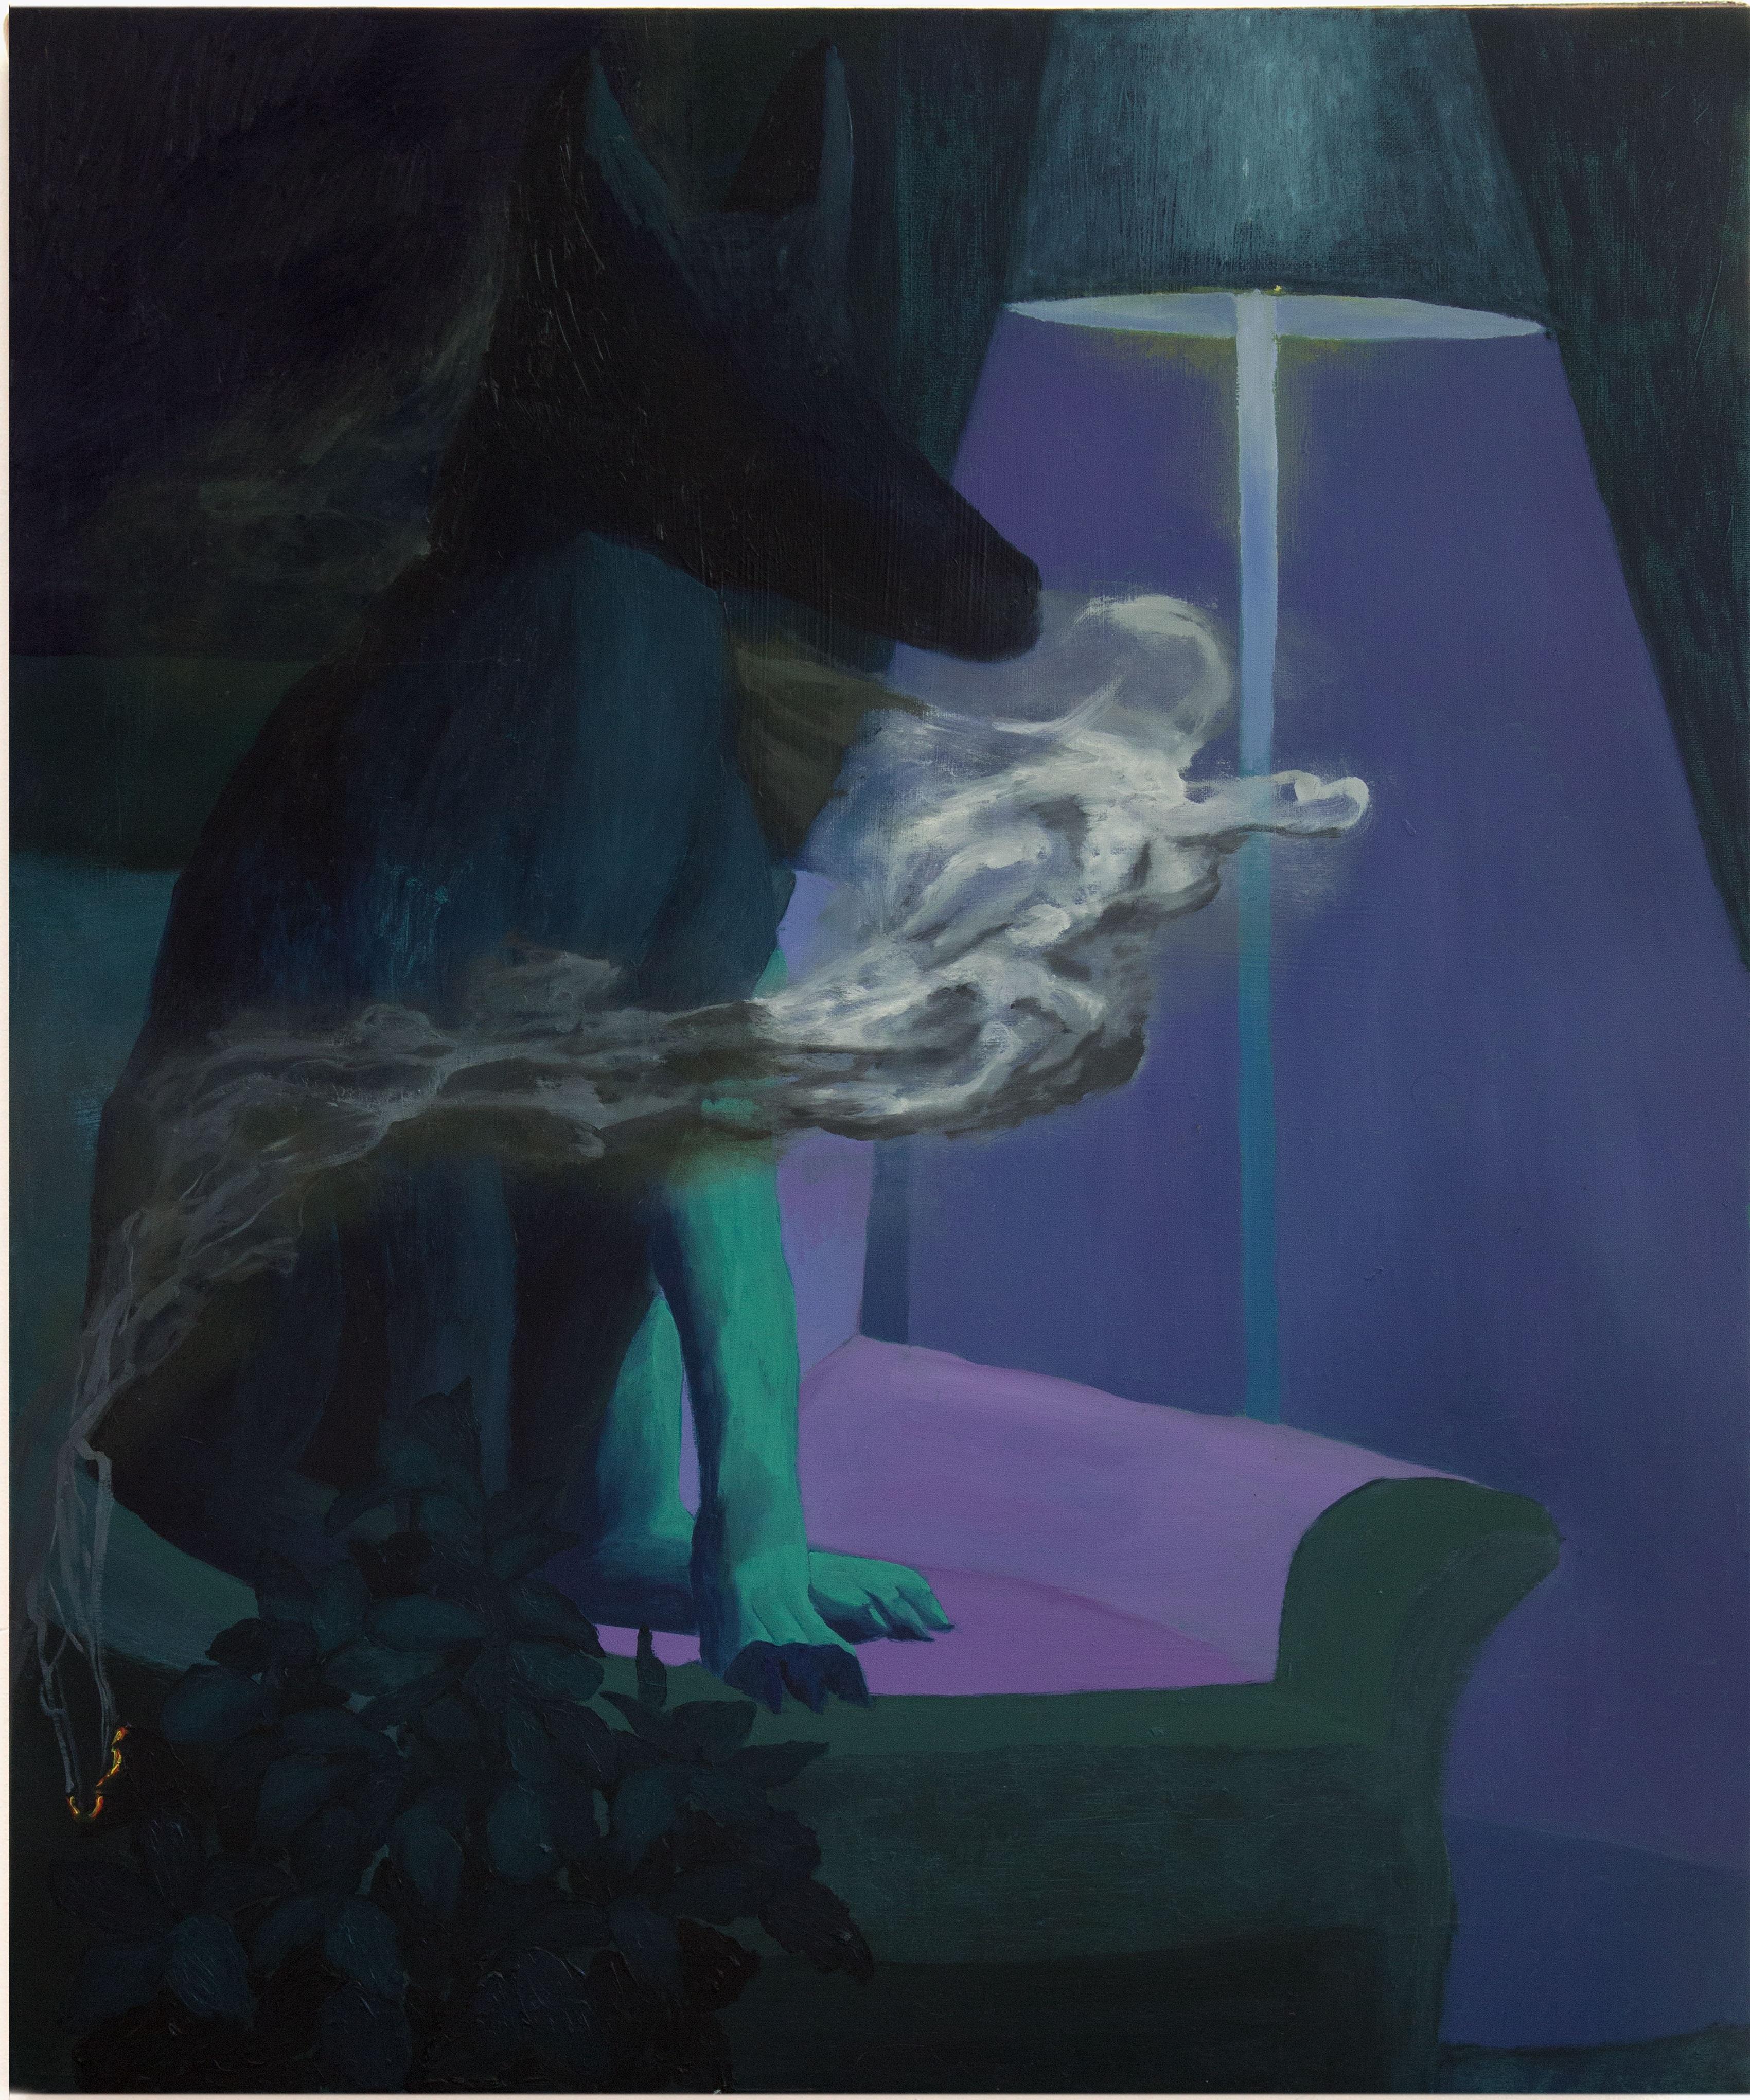 Alessandro Fogo - Incenso, 80 x 100 cm, Olio su tela, 2019